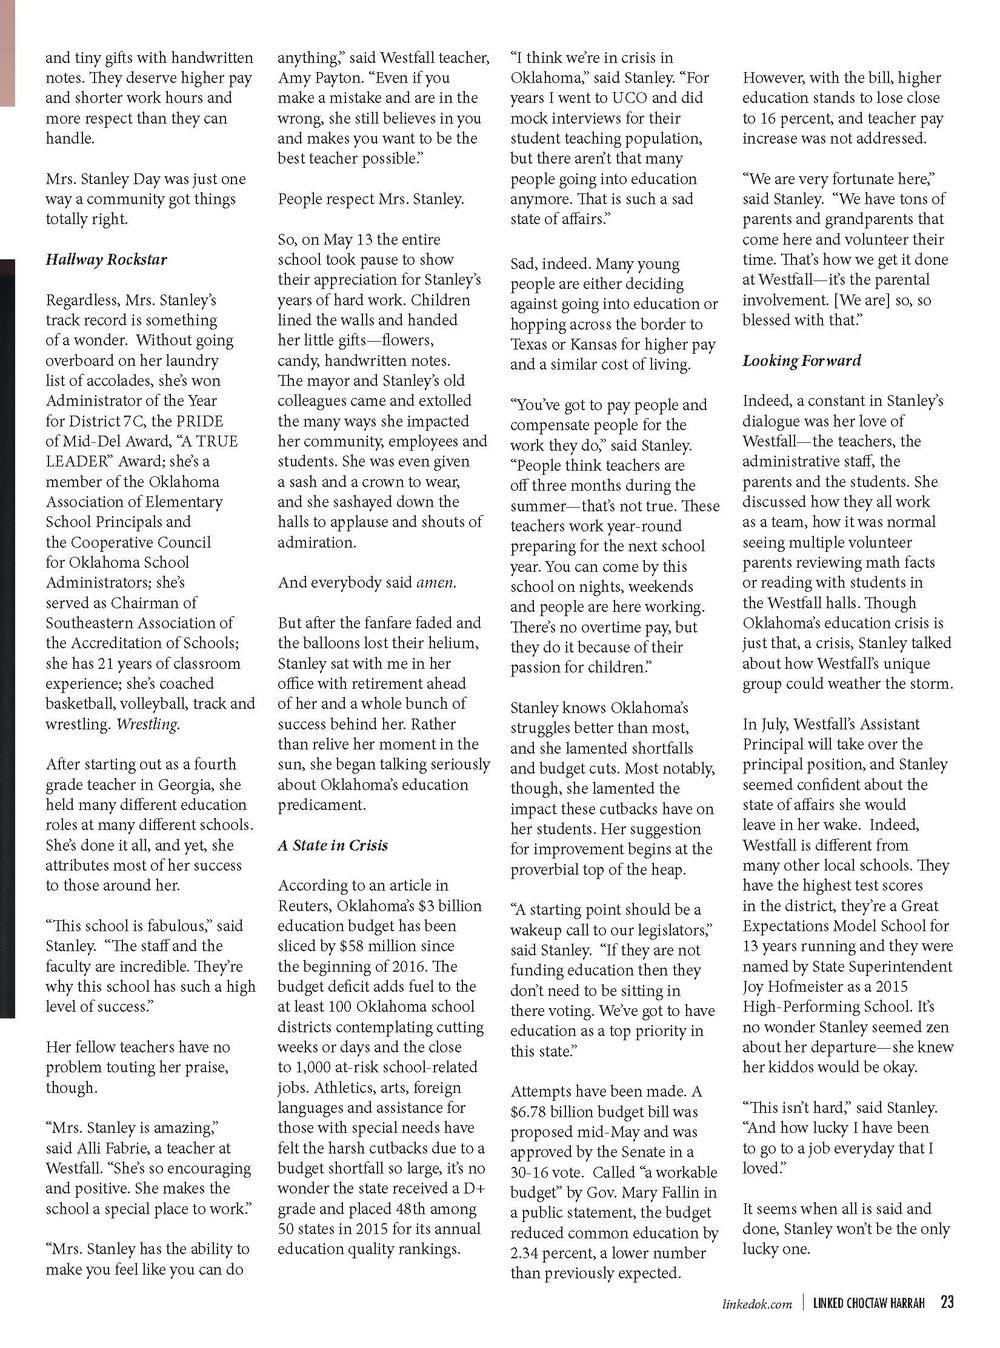 HighFive_ChoctawHarrah_June 2016 REVISED_Page_23.jpg